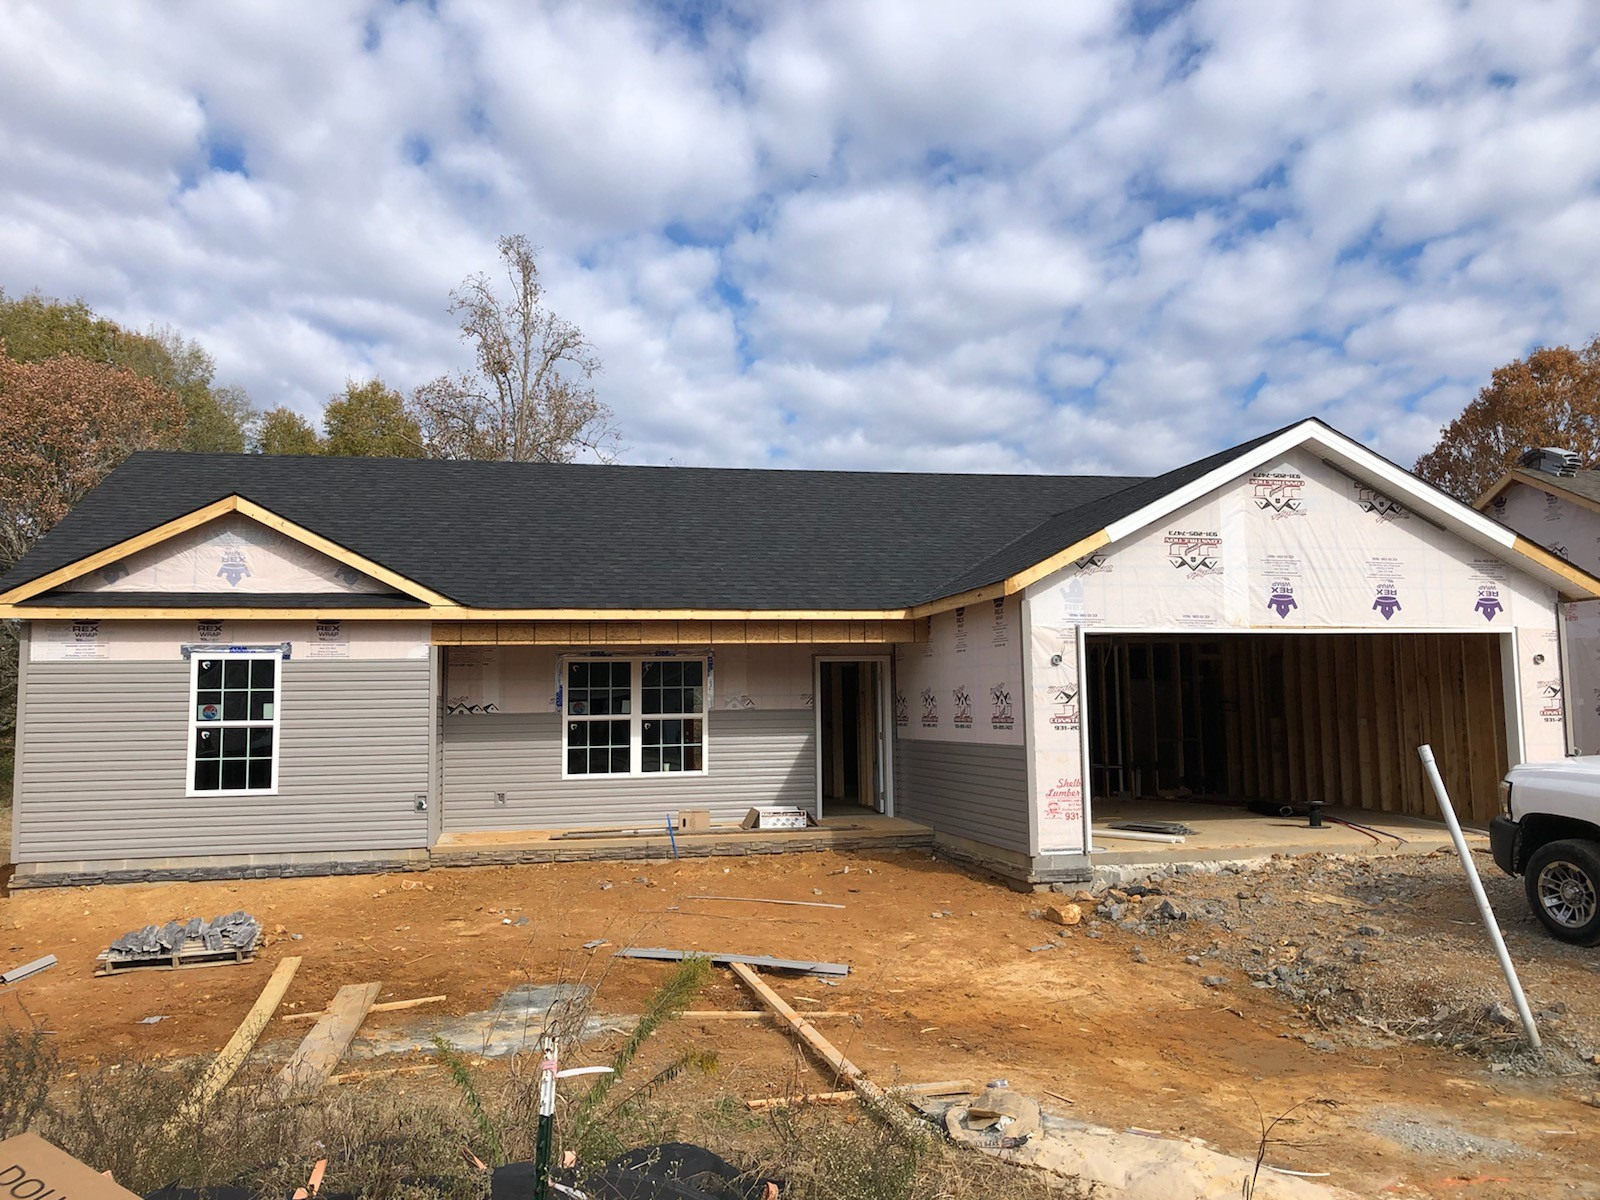 102 Collinwood Dr, Tullahoma, TN 37388 - Tullahoma, TN real estate listing